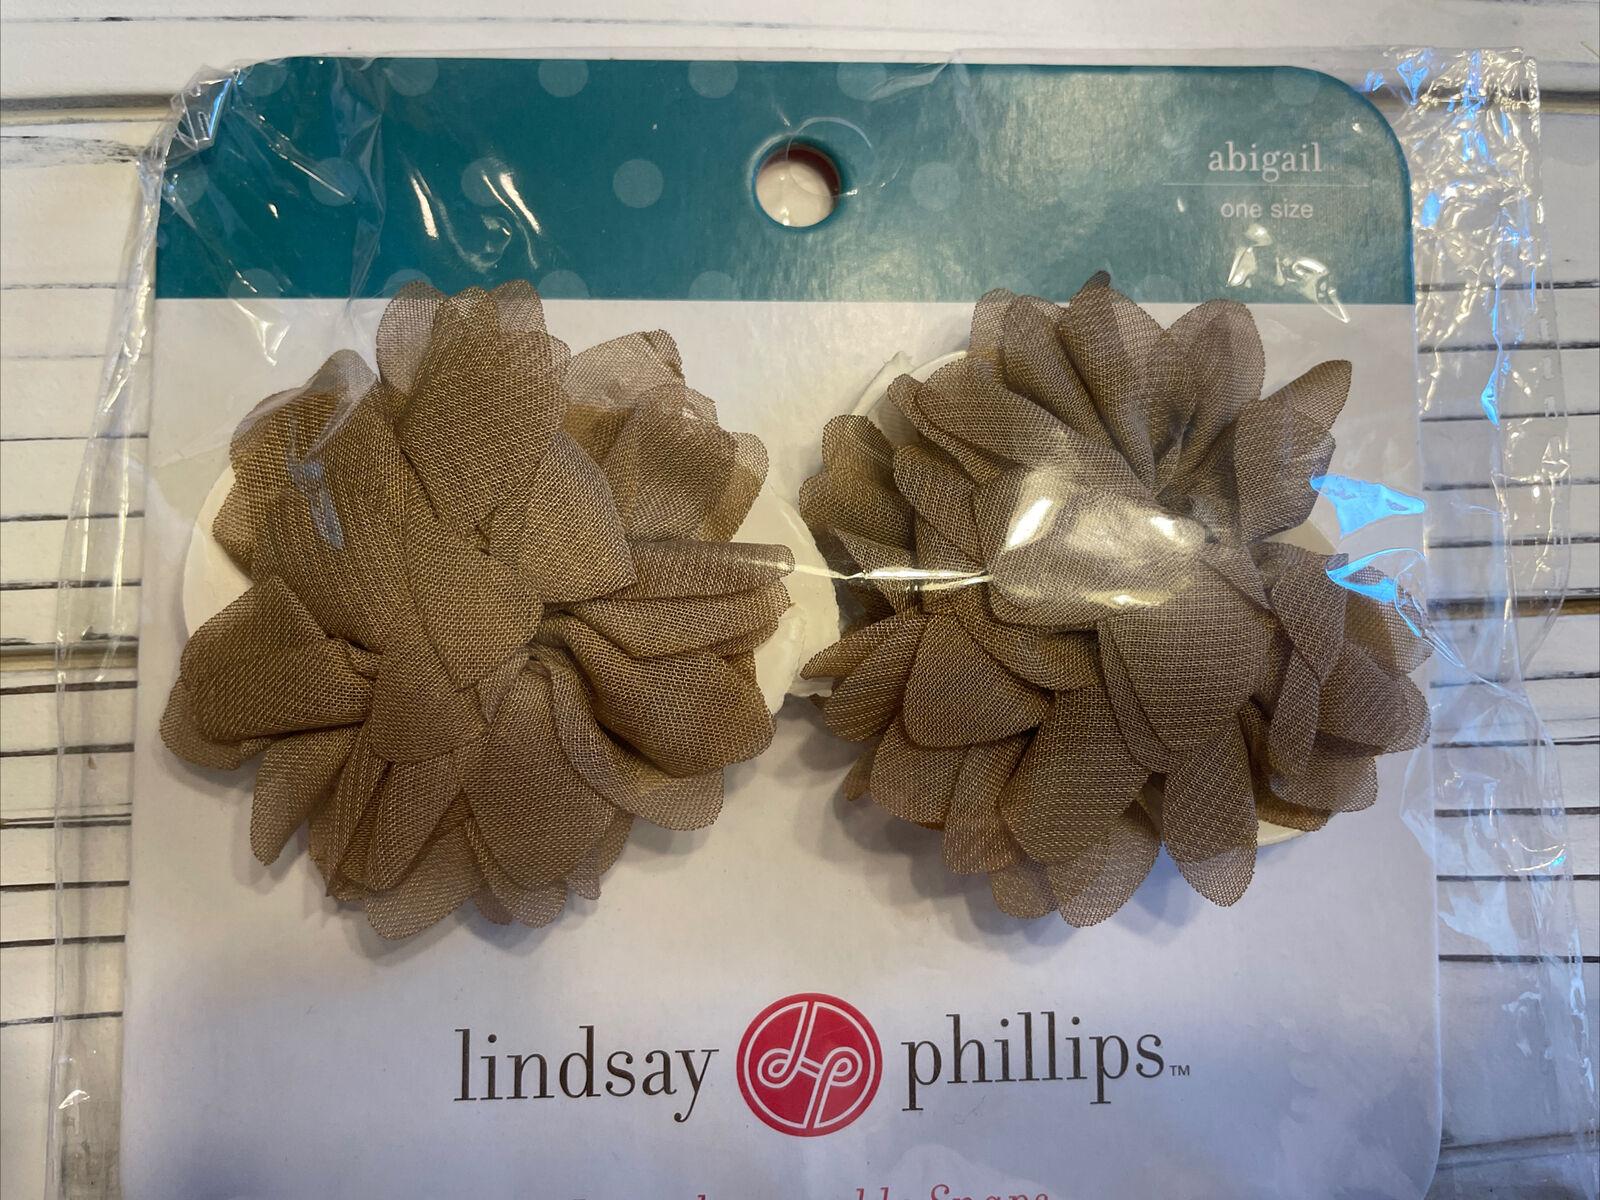 Lindsay Phillips Interchangeable Snaps Abigail shoe charms